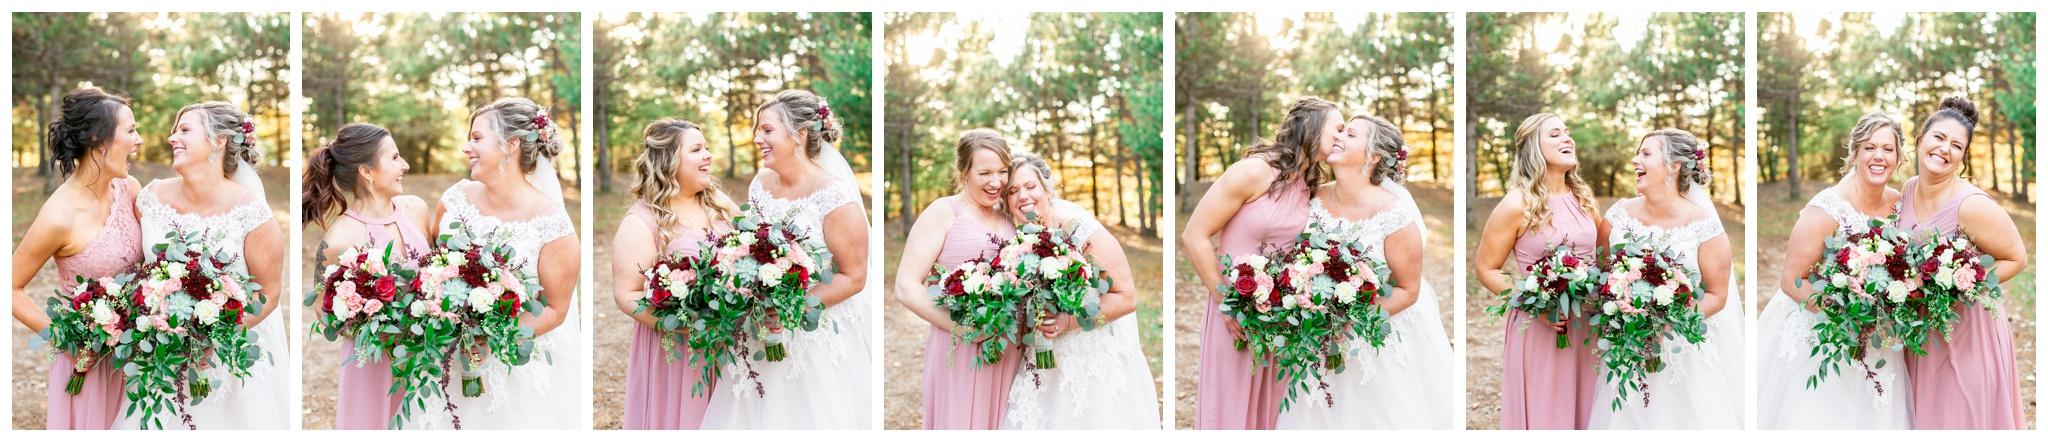 Shawano_County_park_Wedding_Caynay_Photo_Madison_Wi_2305.jpg